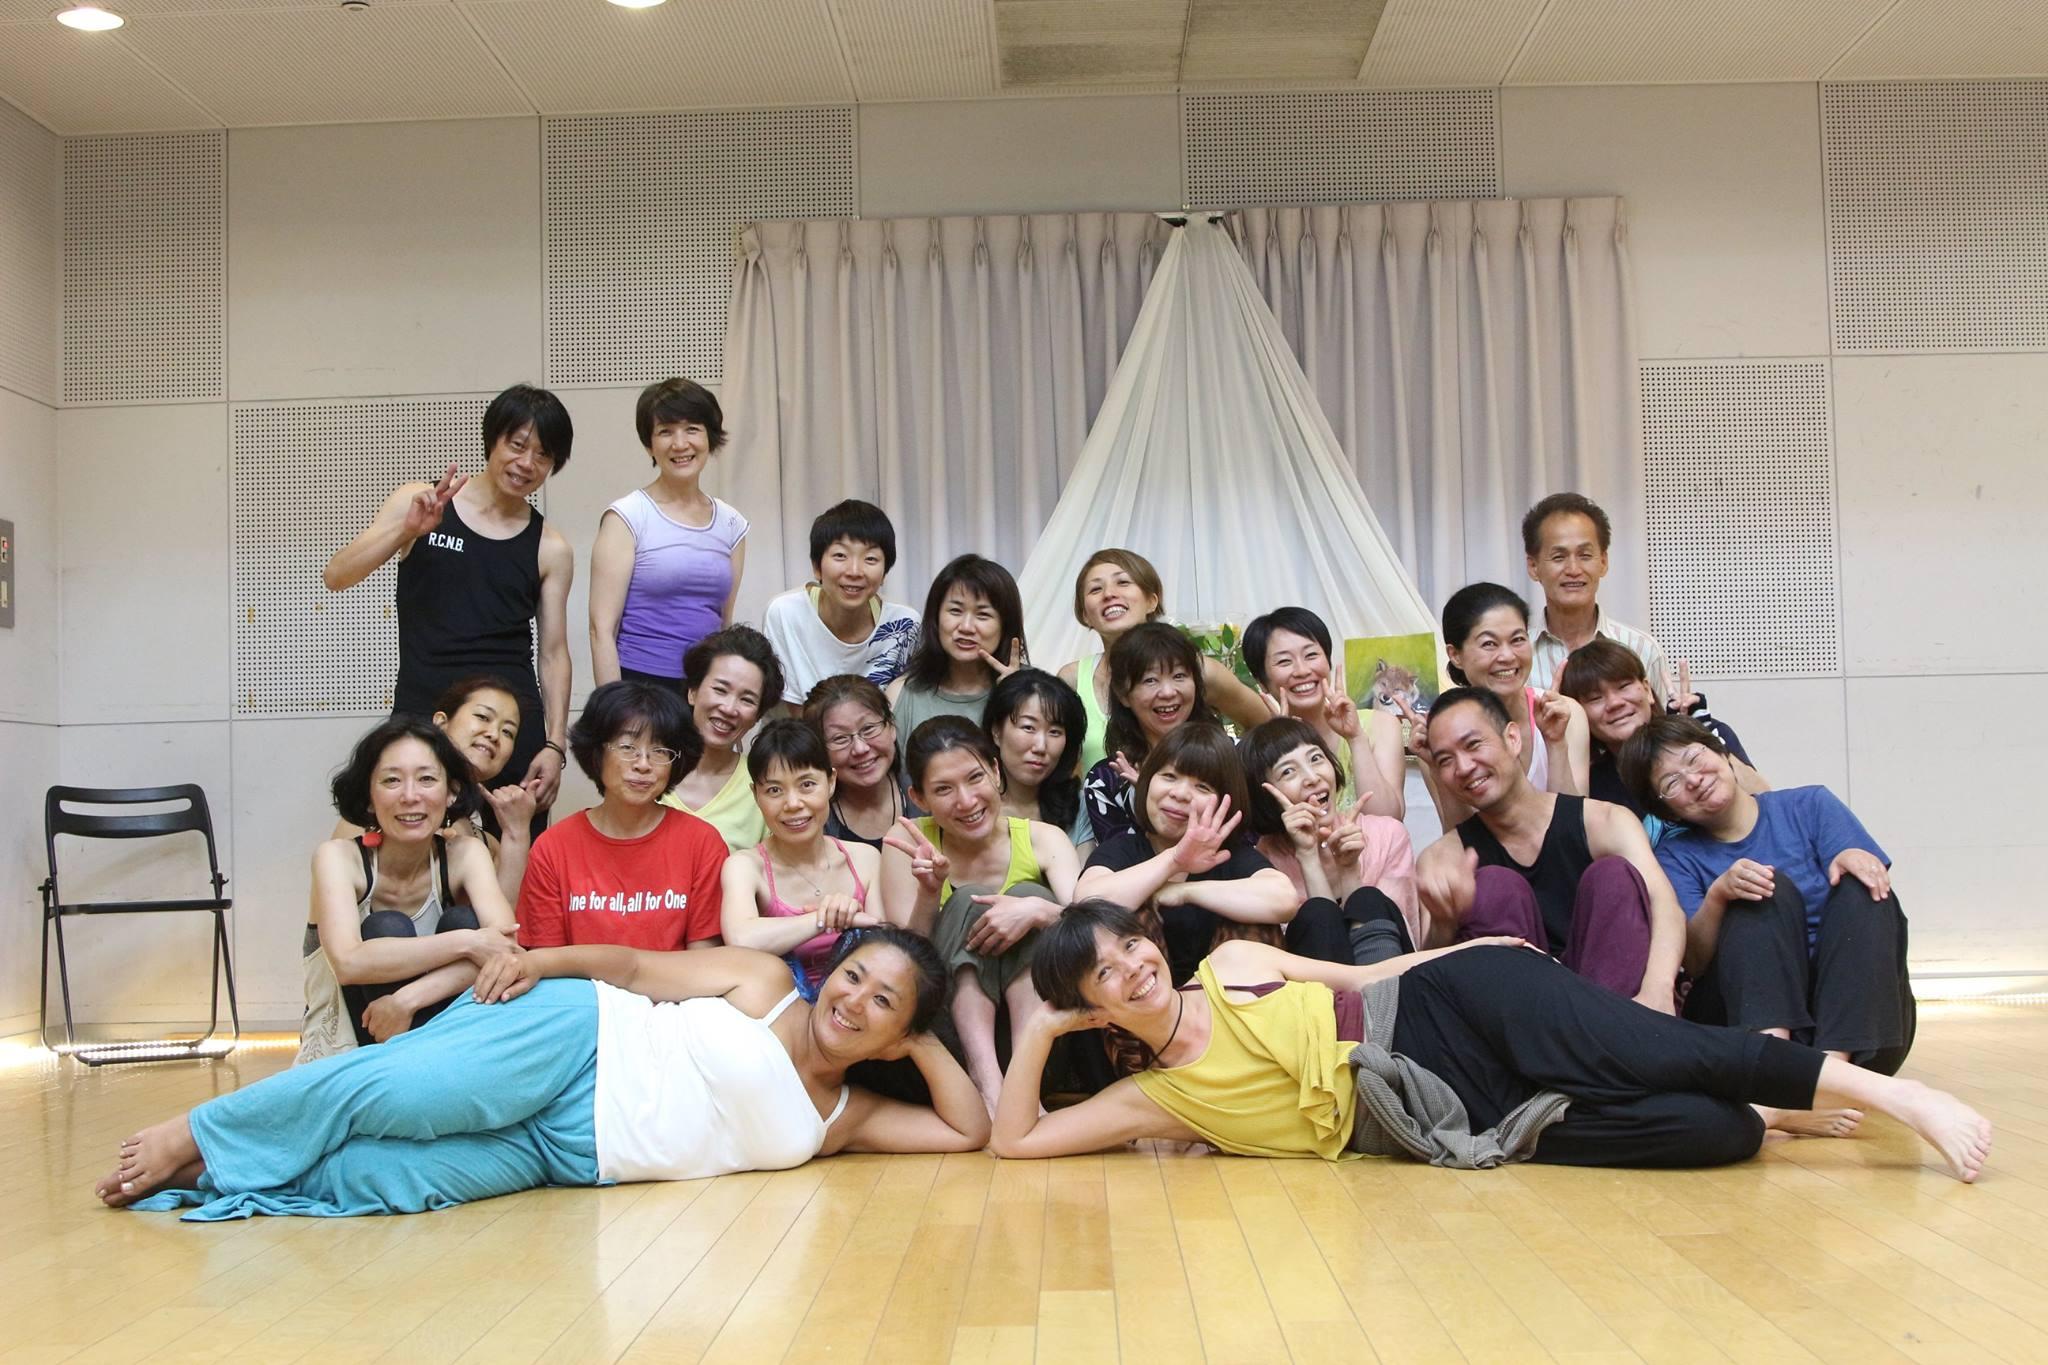 Masayo_名古屋ワークショップ終了しました。